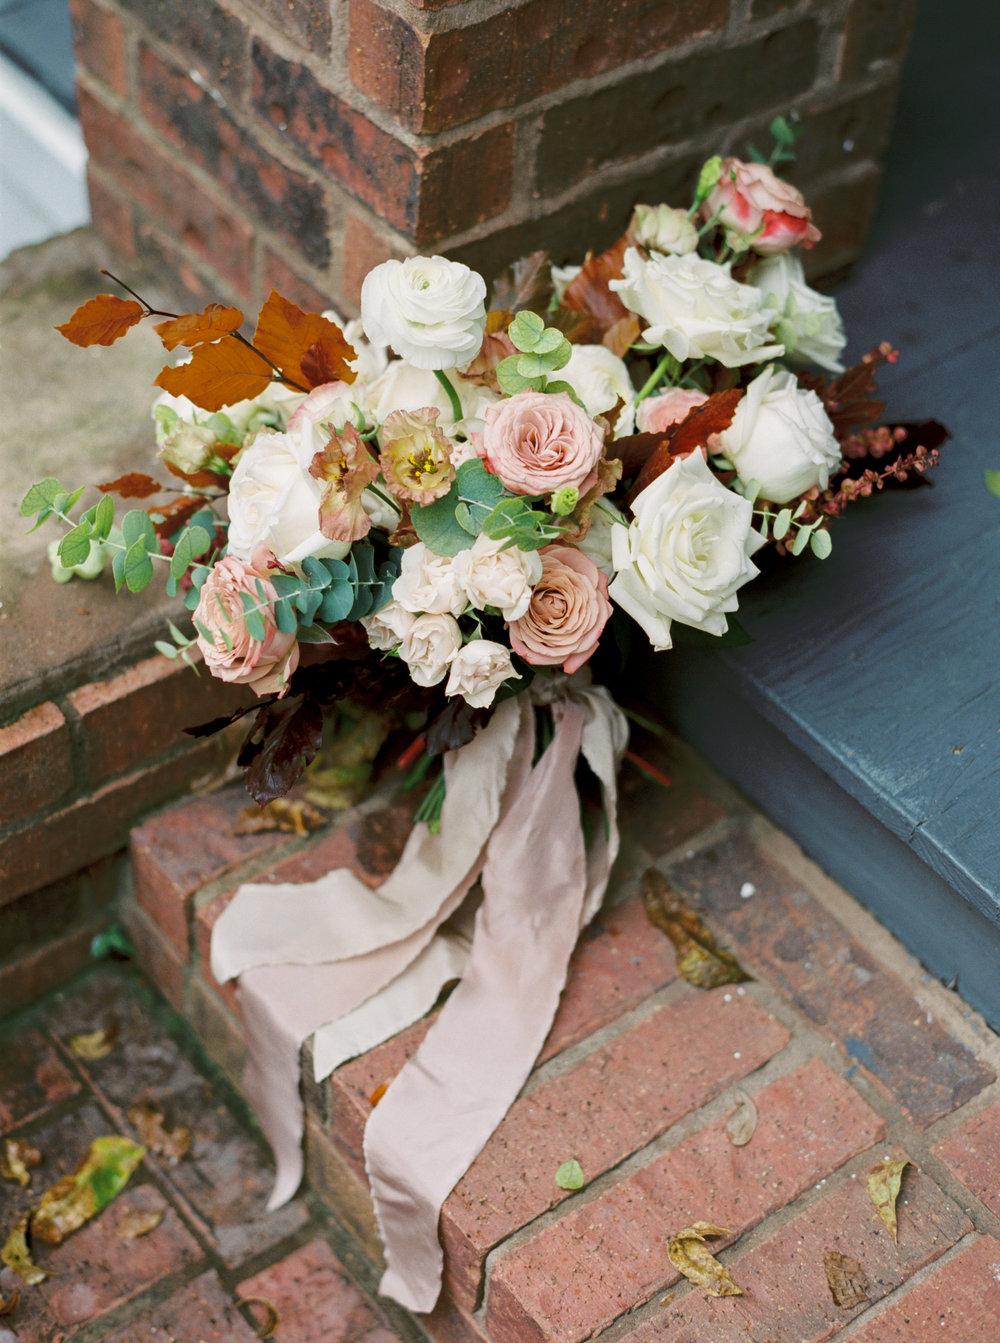 Fall_Wedding_Colors_Bouquet_Maxit_Flower_Design_Hanging_Ribbon.jpg